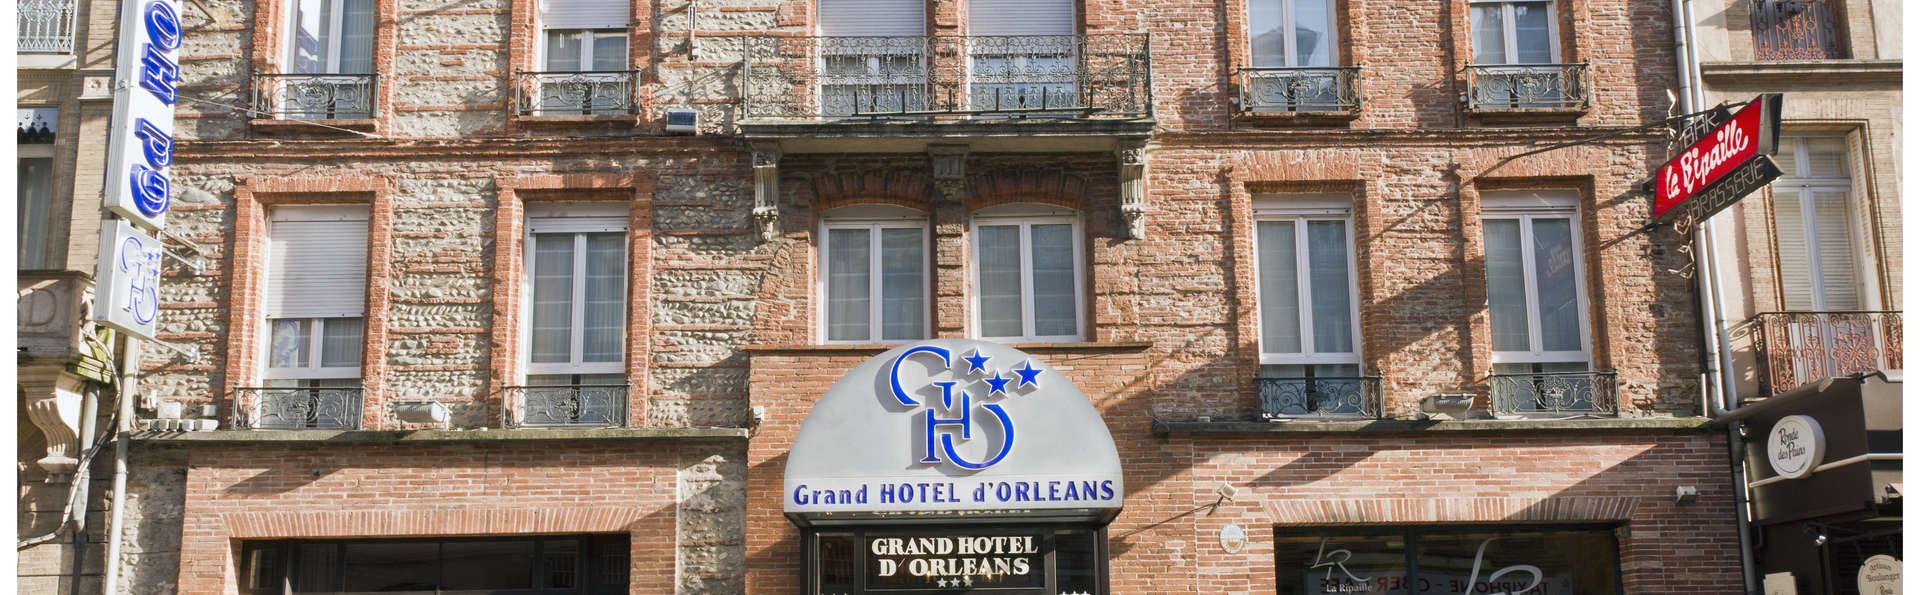 Grand Hôtel d'Orléans - Façade